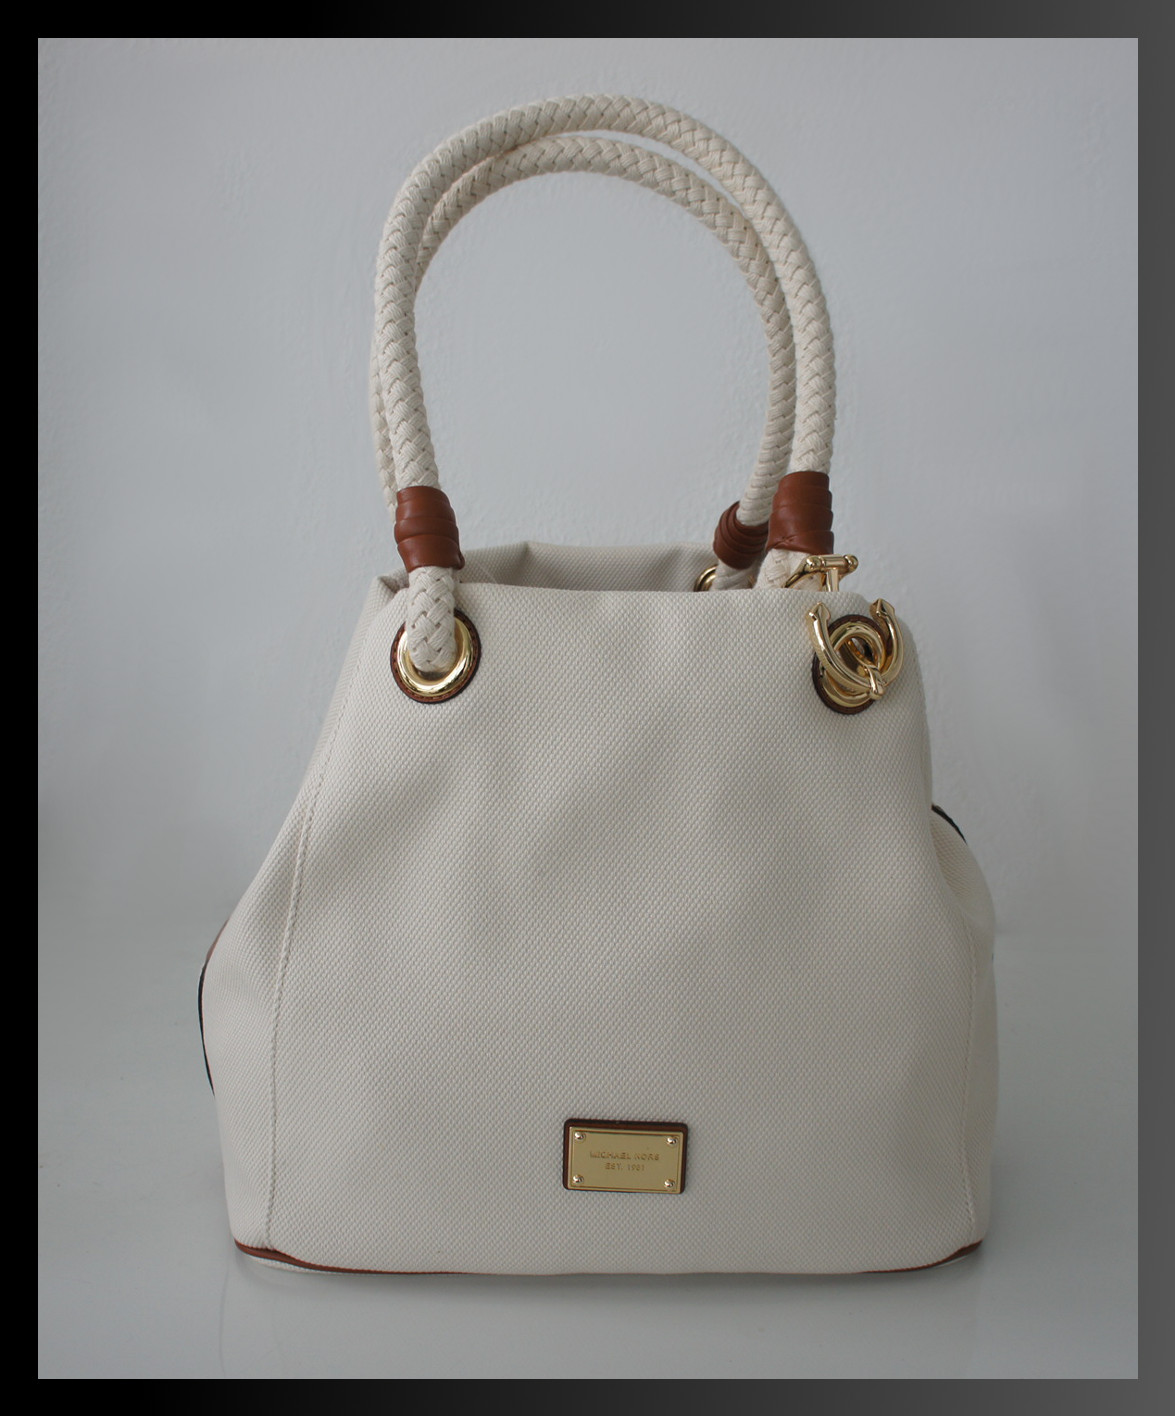 michael kors tasche marina gro weiss handtasche leder textil neu ebay. Black Bedroom Furniture Sets. Home Design Ideas